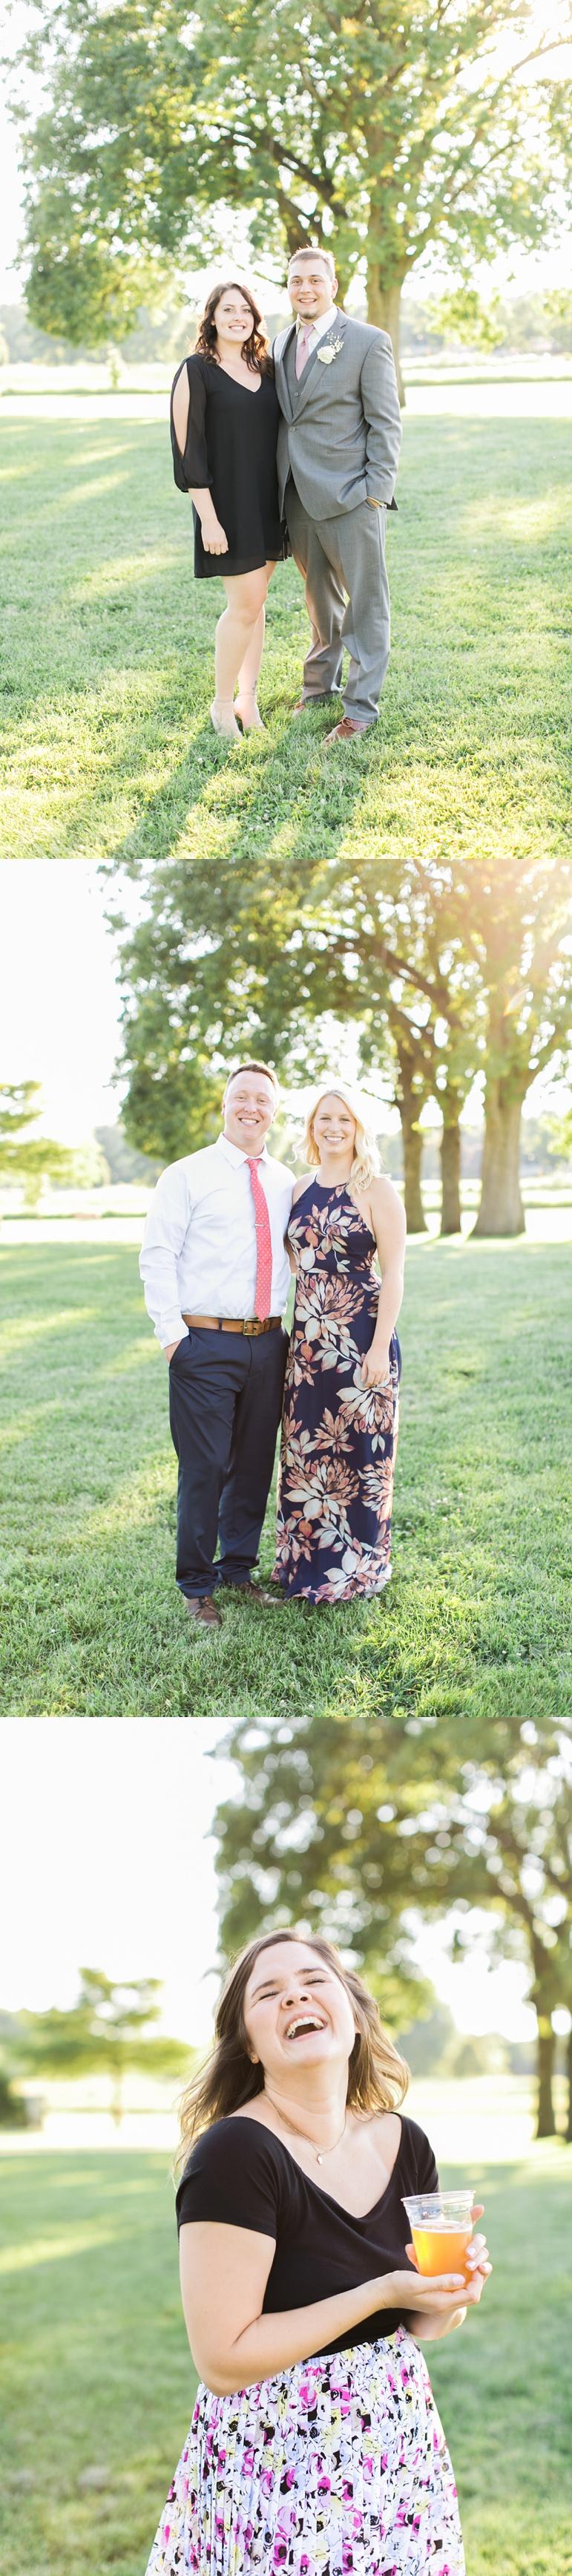 Warner Park Community Center Madison WI Wedding